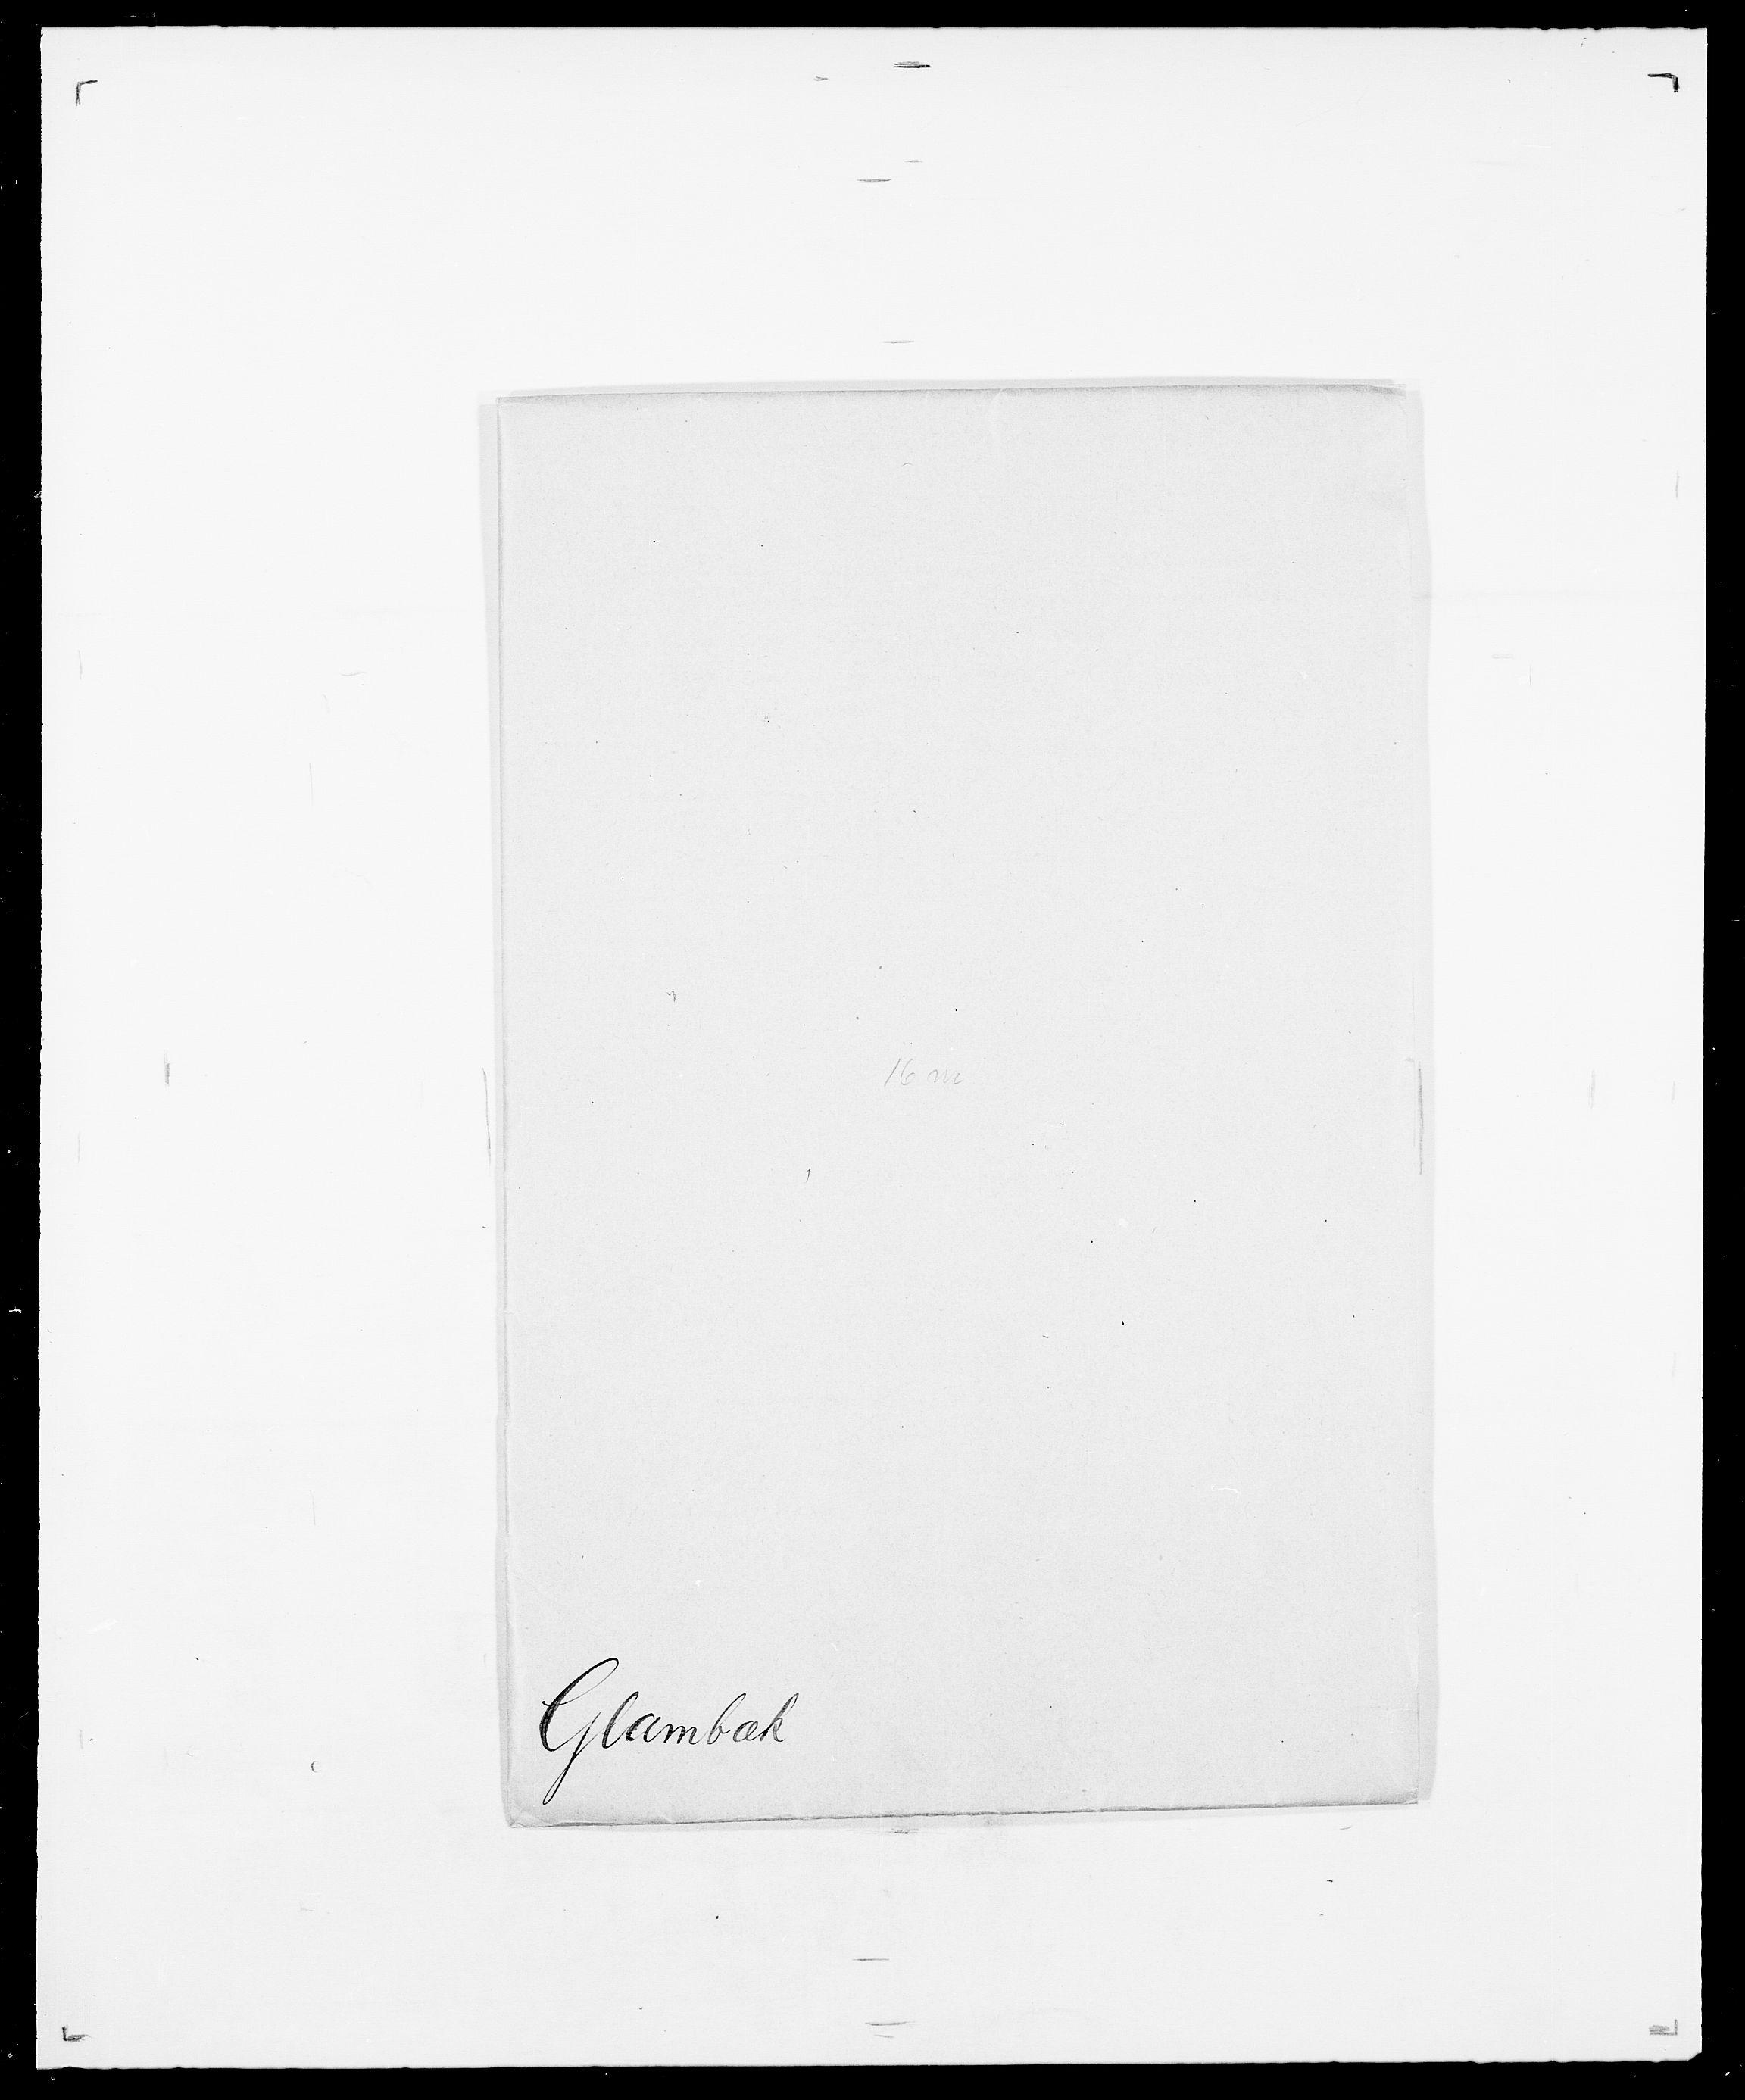 SAO, Delgobe, Charles Antoine - samling, D/Da/L0014: Giebdhausen - Grip, s. 274